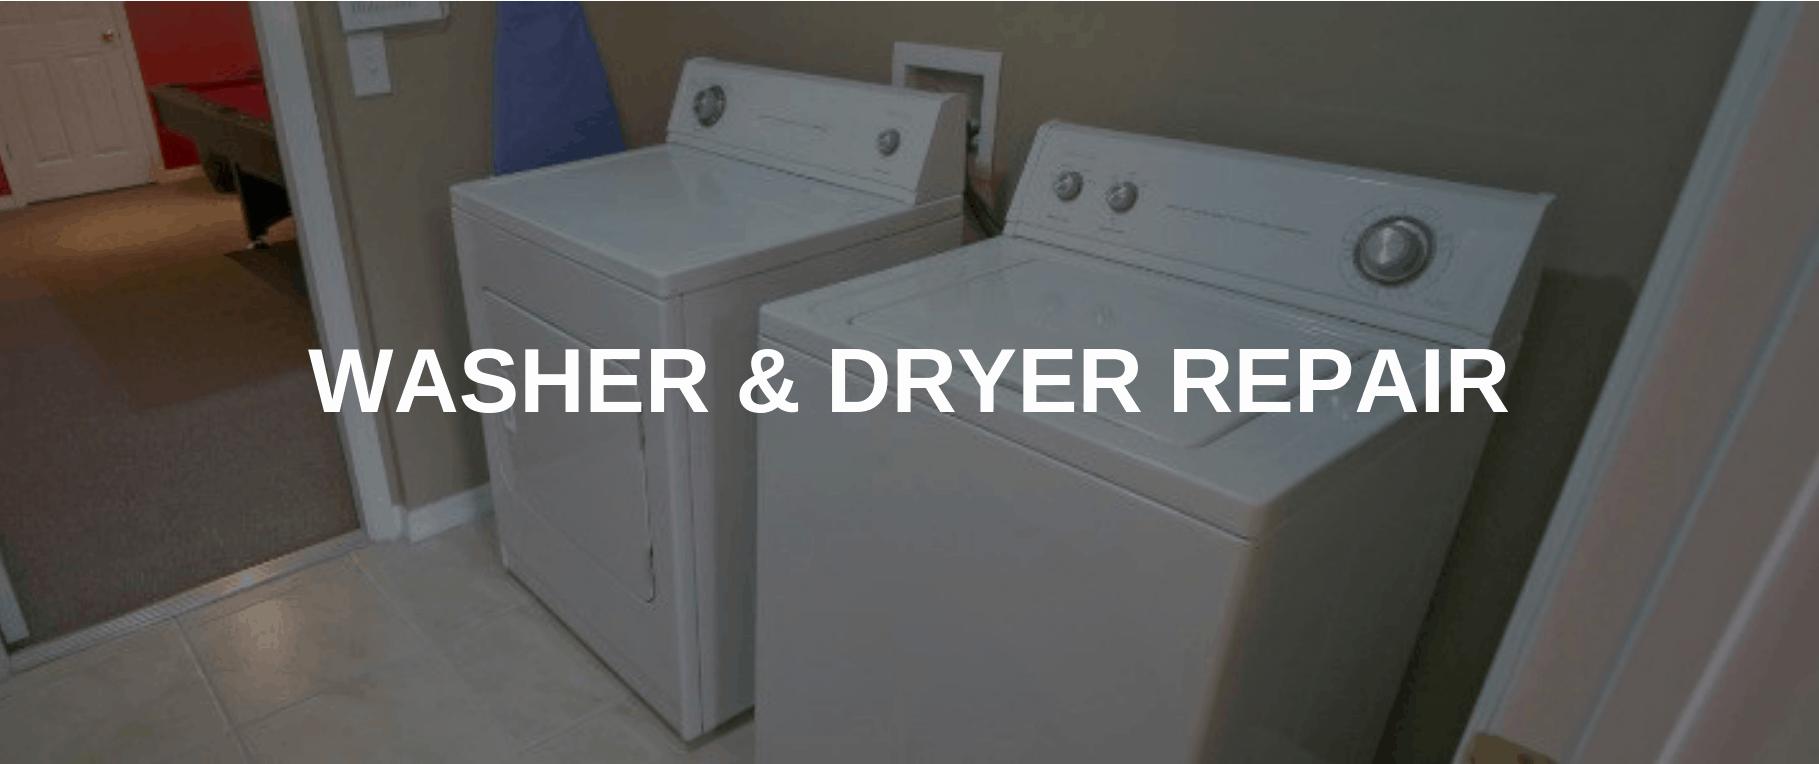 washing machine repair bowie